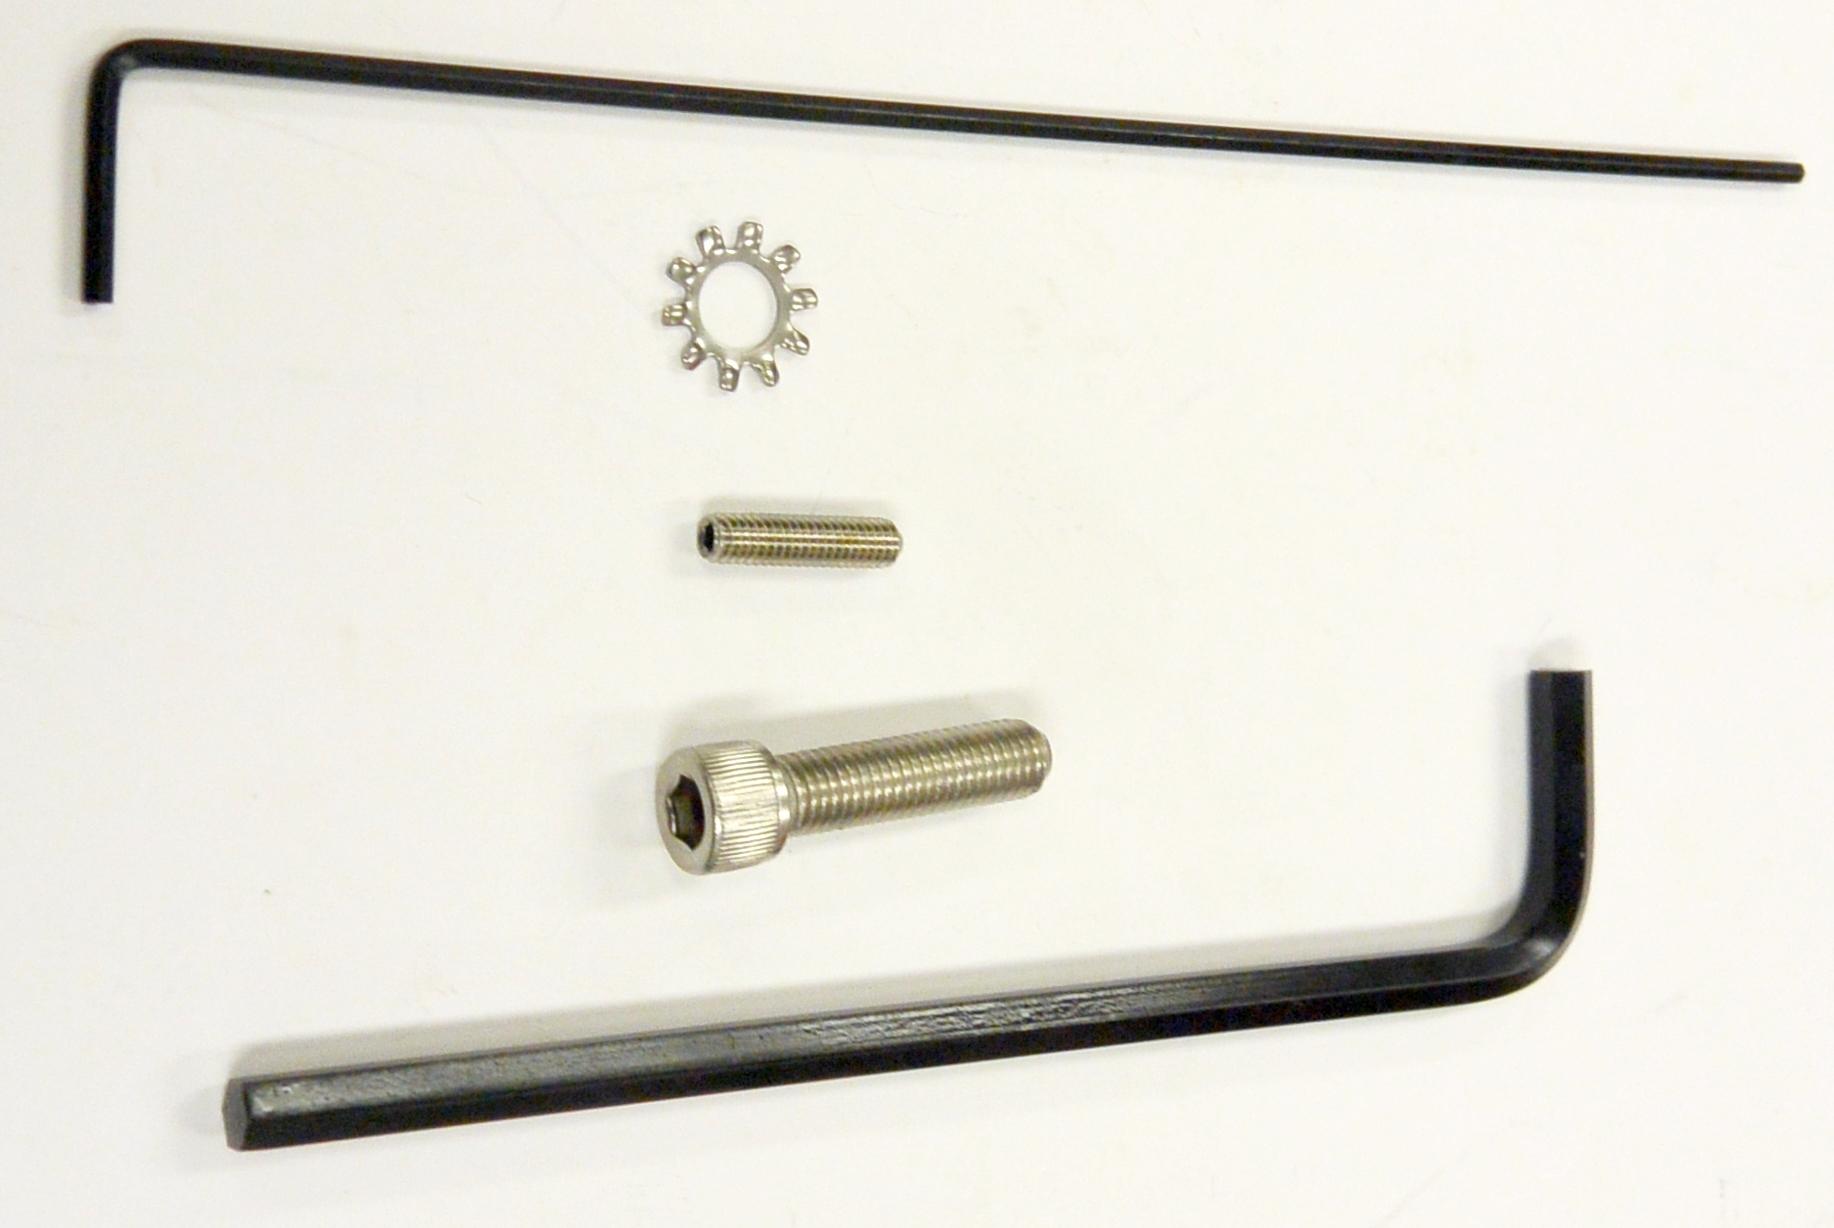 AR15 AR10 Mil-Spec Trigger Creep Adjustment Pistol Grip Screw .223 5.56 AR 15  10 M4 M16 Best Discount Wholesale AR Parts and Accessories Austin Texas USA